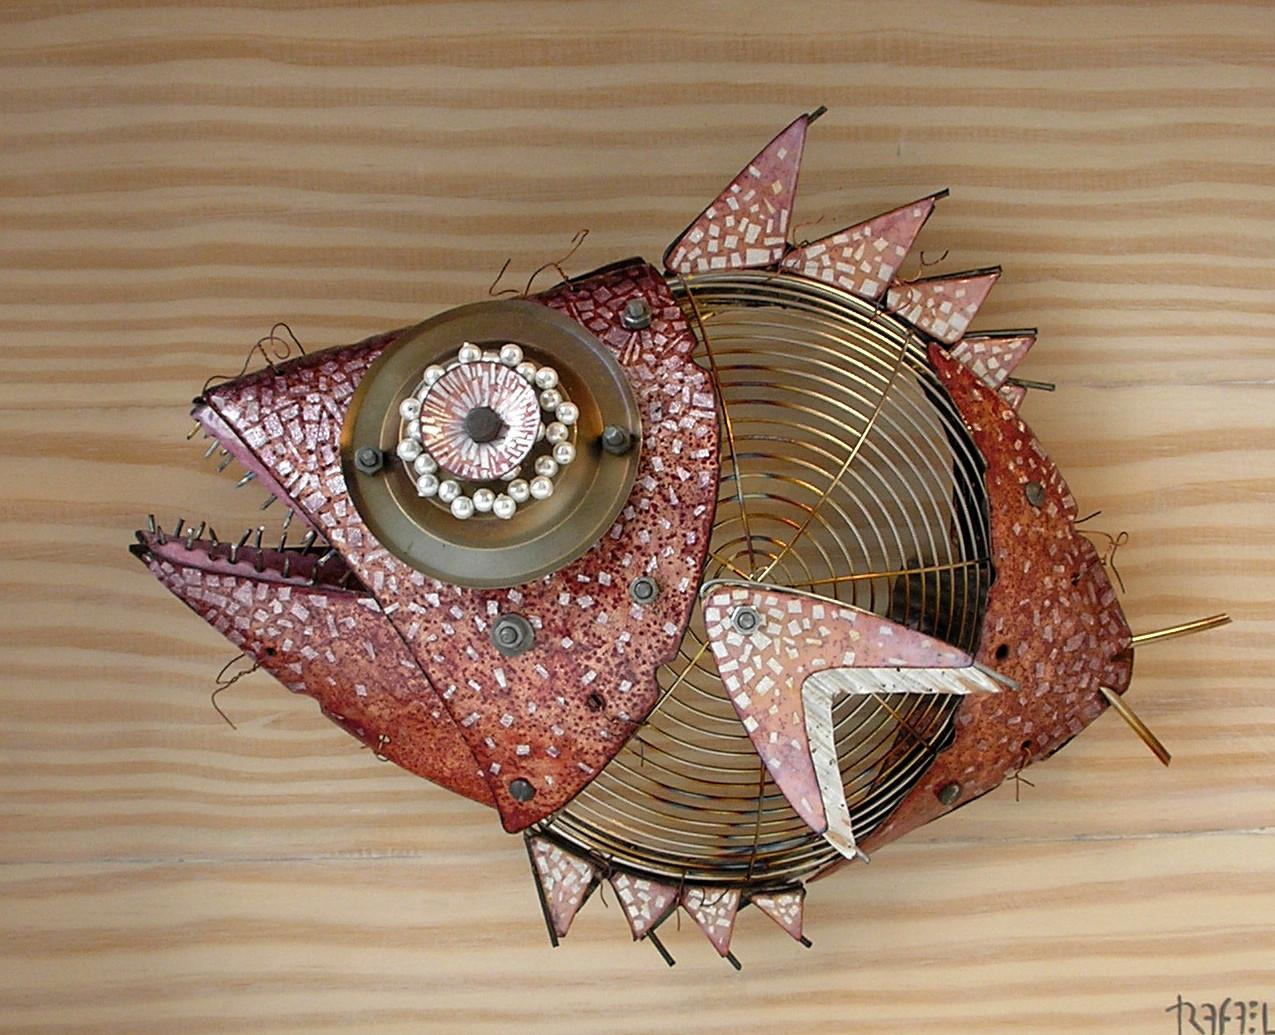 Creatura Marina Perlada (2017) - Rafael Arroyo Villemur